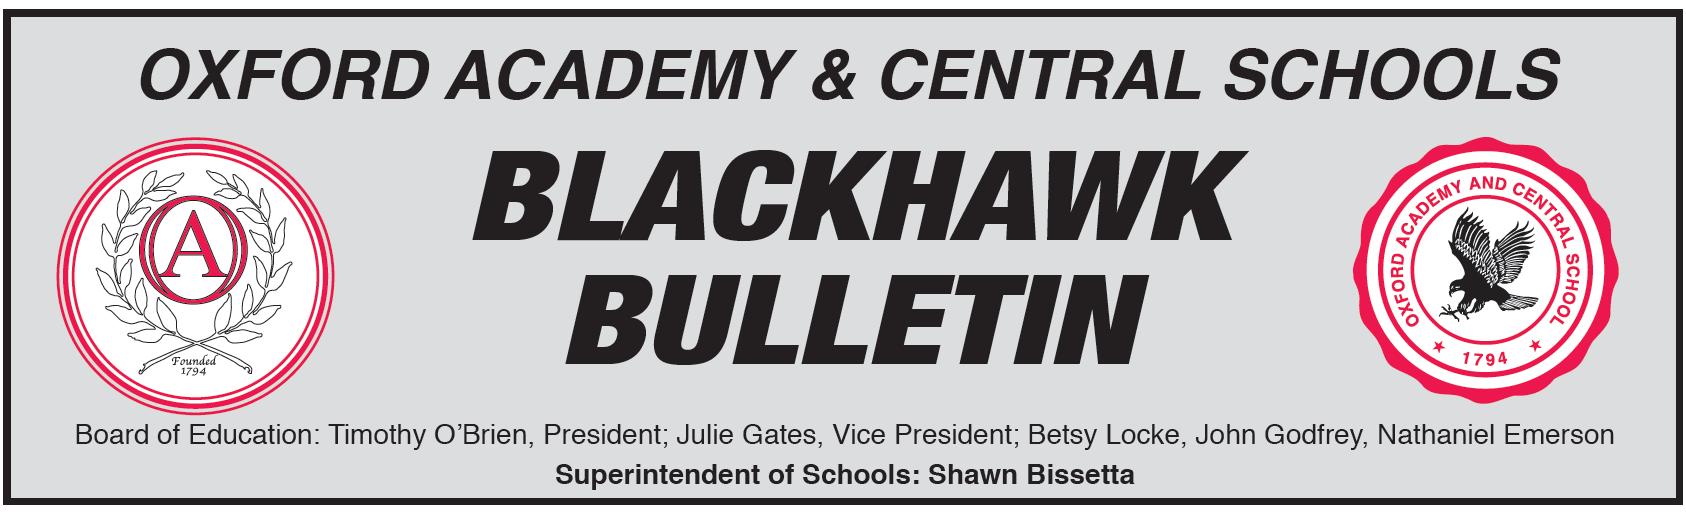 Blackhawk Bulletin